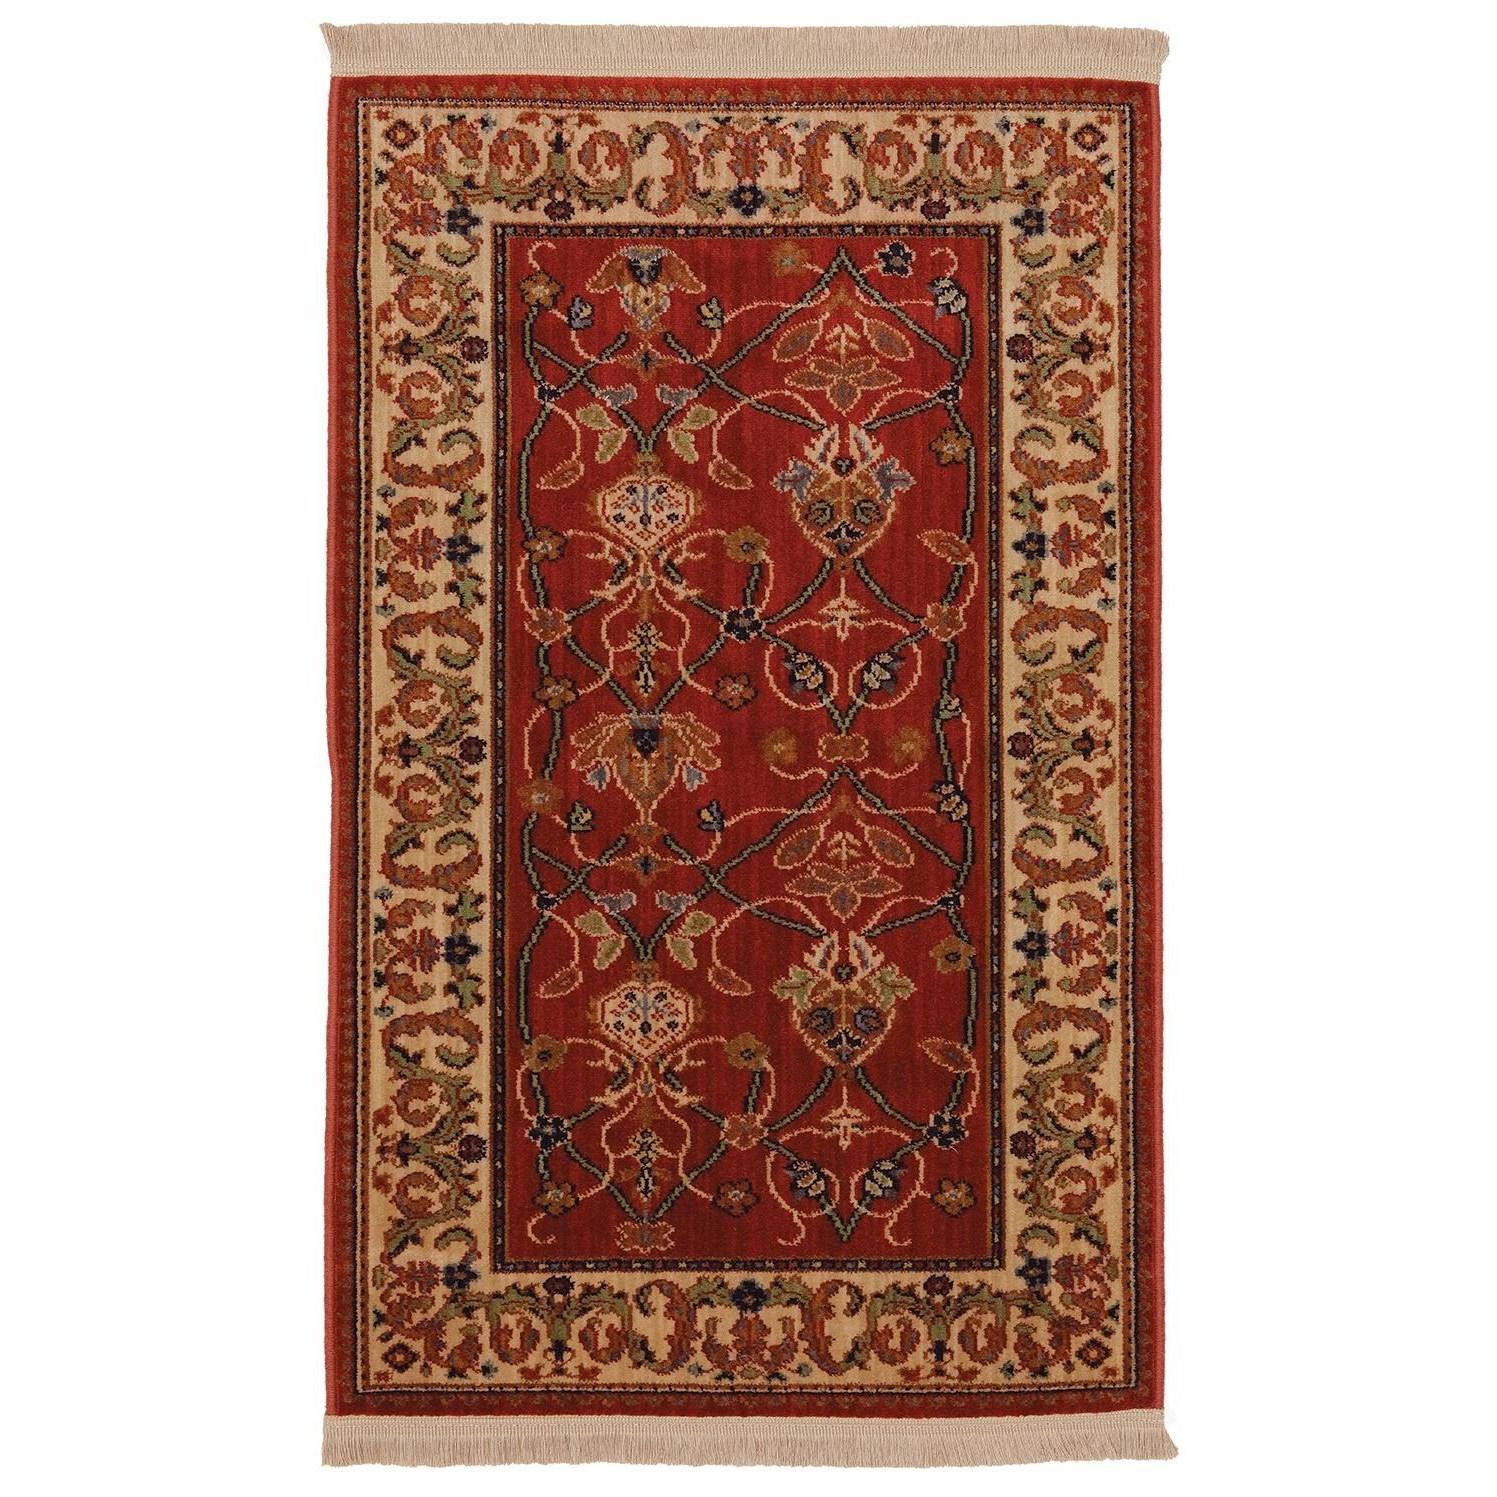 Karastan Rugs English Manor 2'9x5' William Morris Red Rug - Item Number: 02120 00510 033060